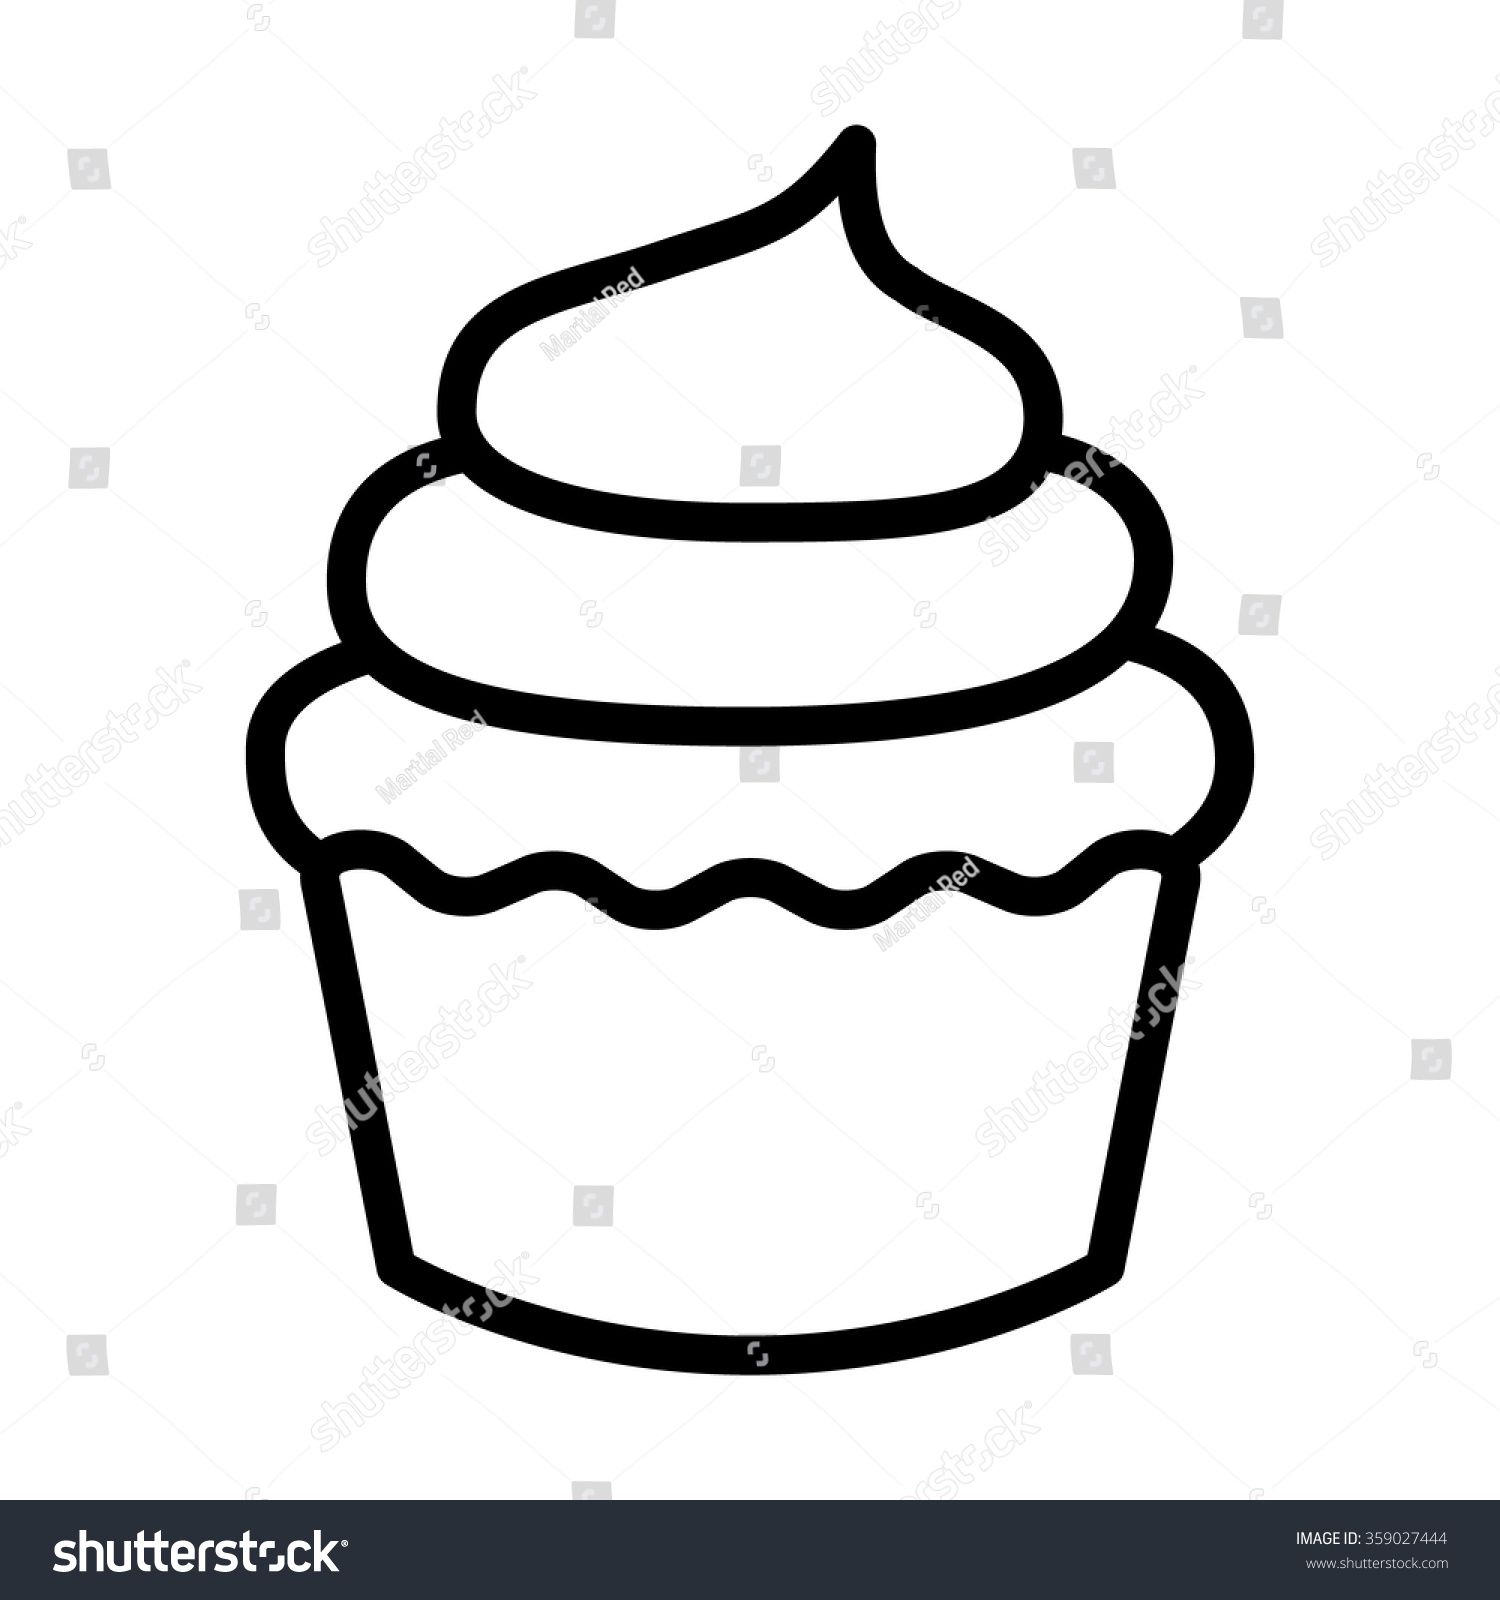 Line Art Website : Cupcake dessert line art icon apps stock vector